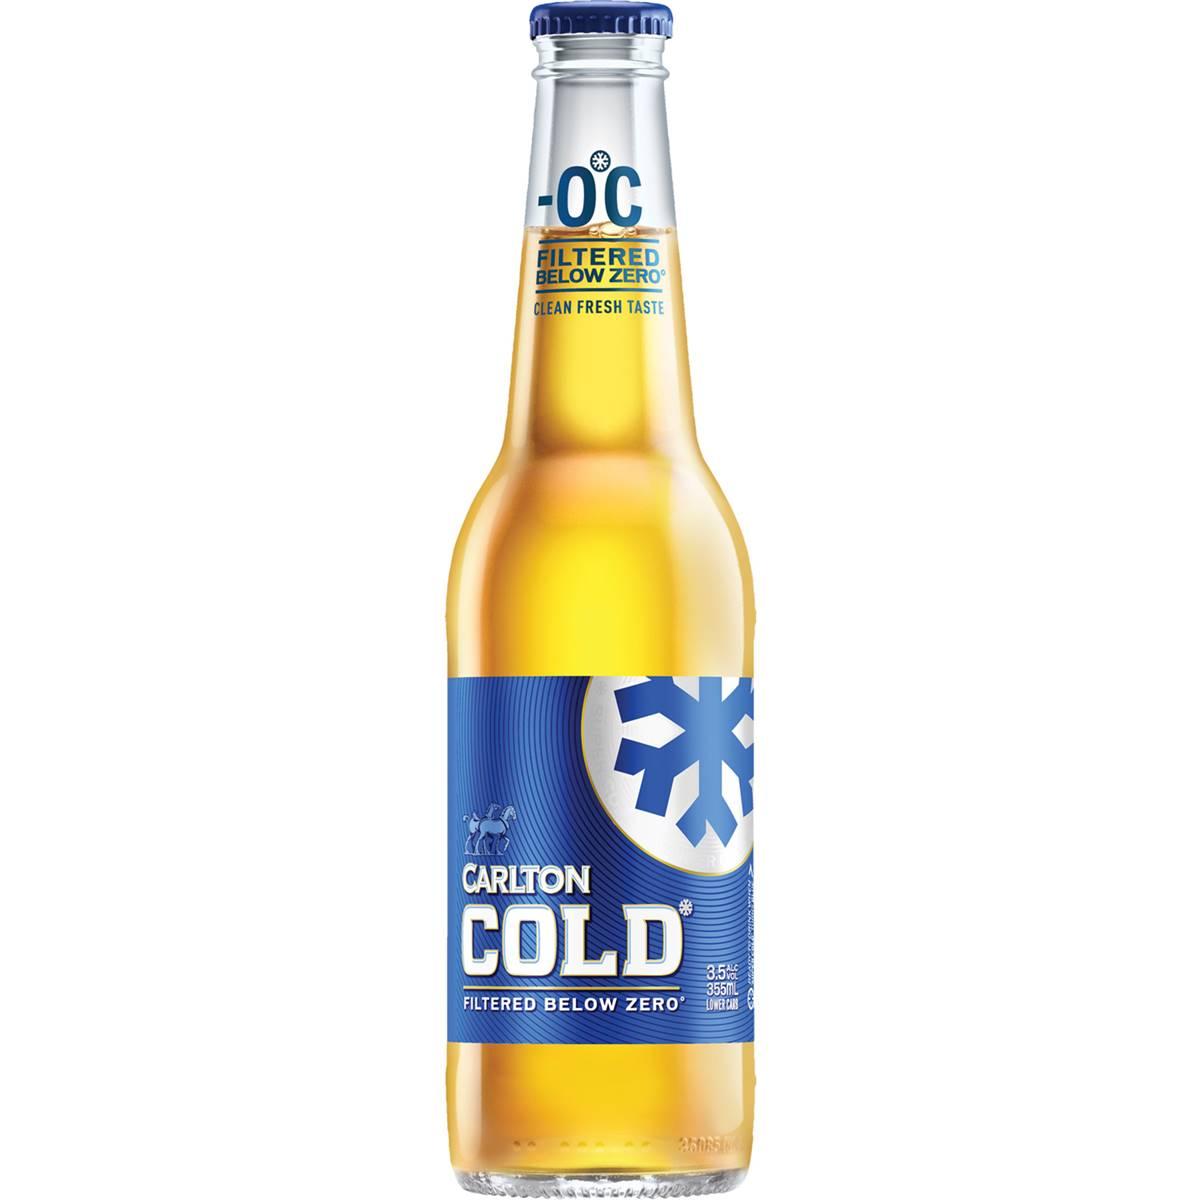 Carlton Cold Lager 3.5% Bottle